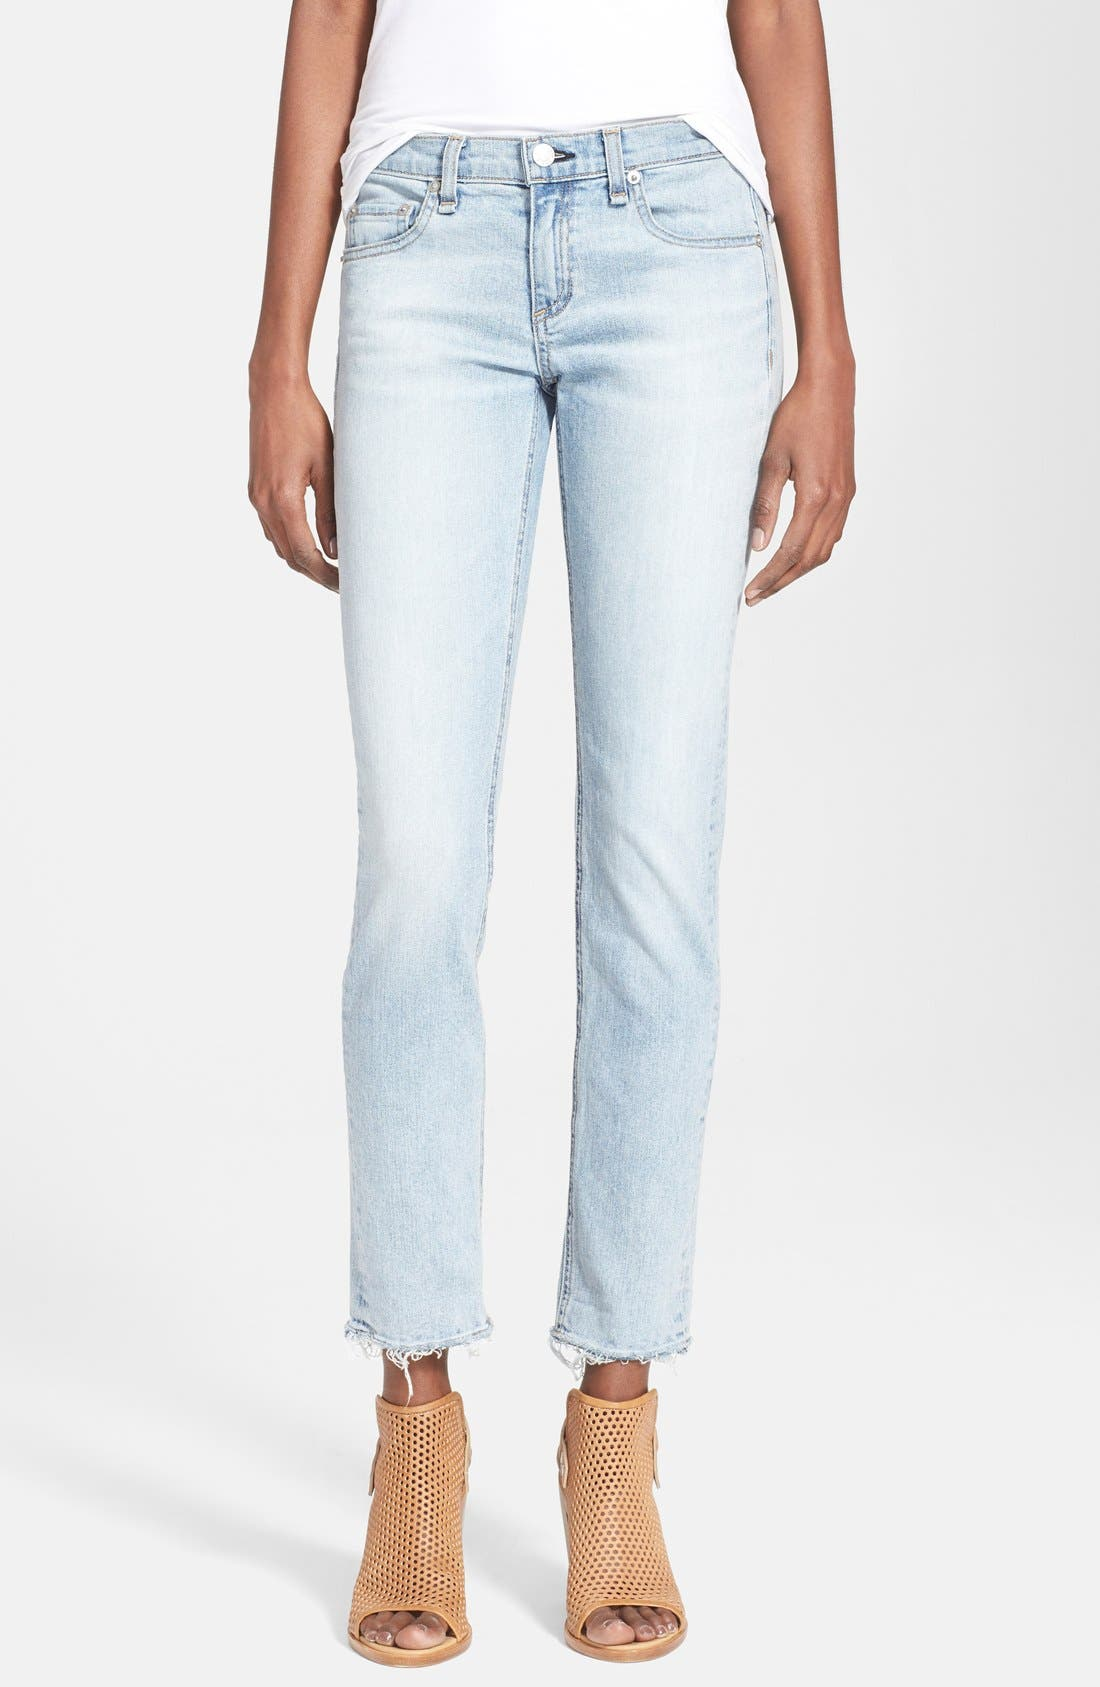 RAG & BONE JEAN 'Dre' Frayed Hem Ankle Jeans, Main, color, 456